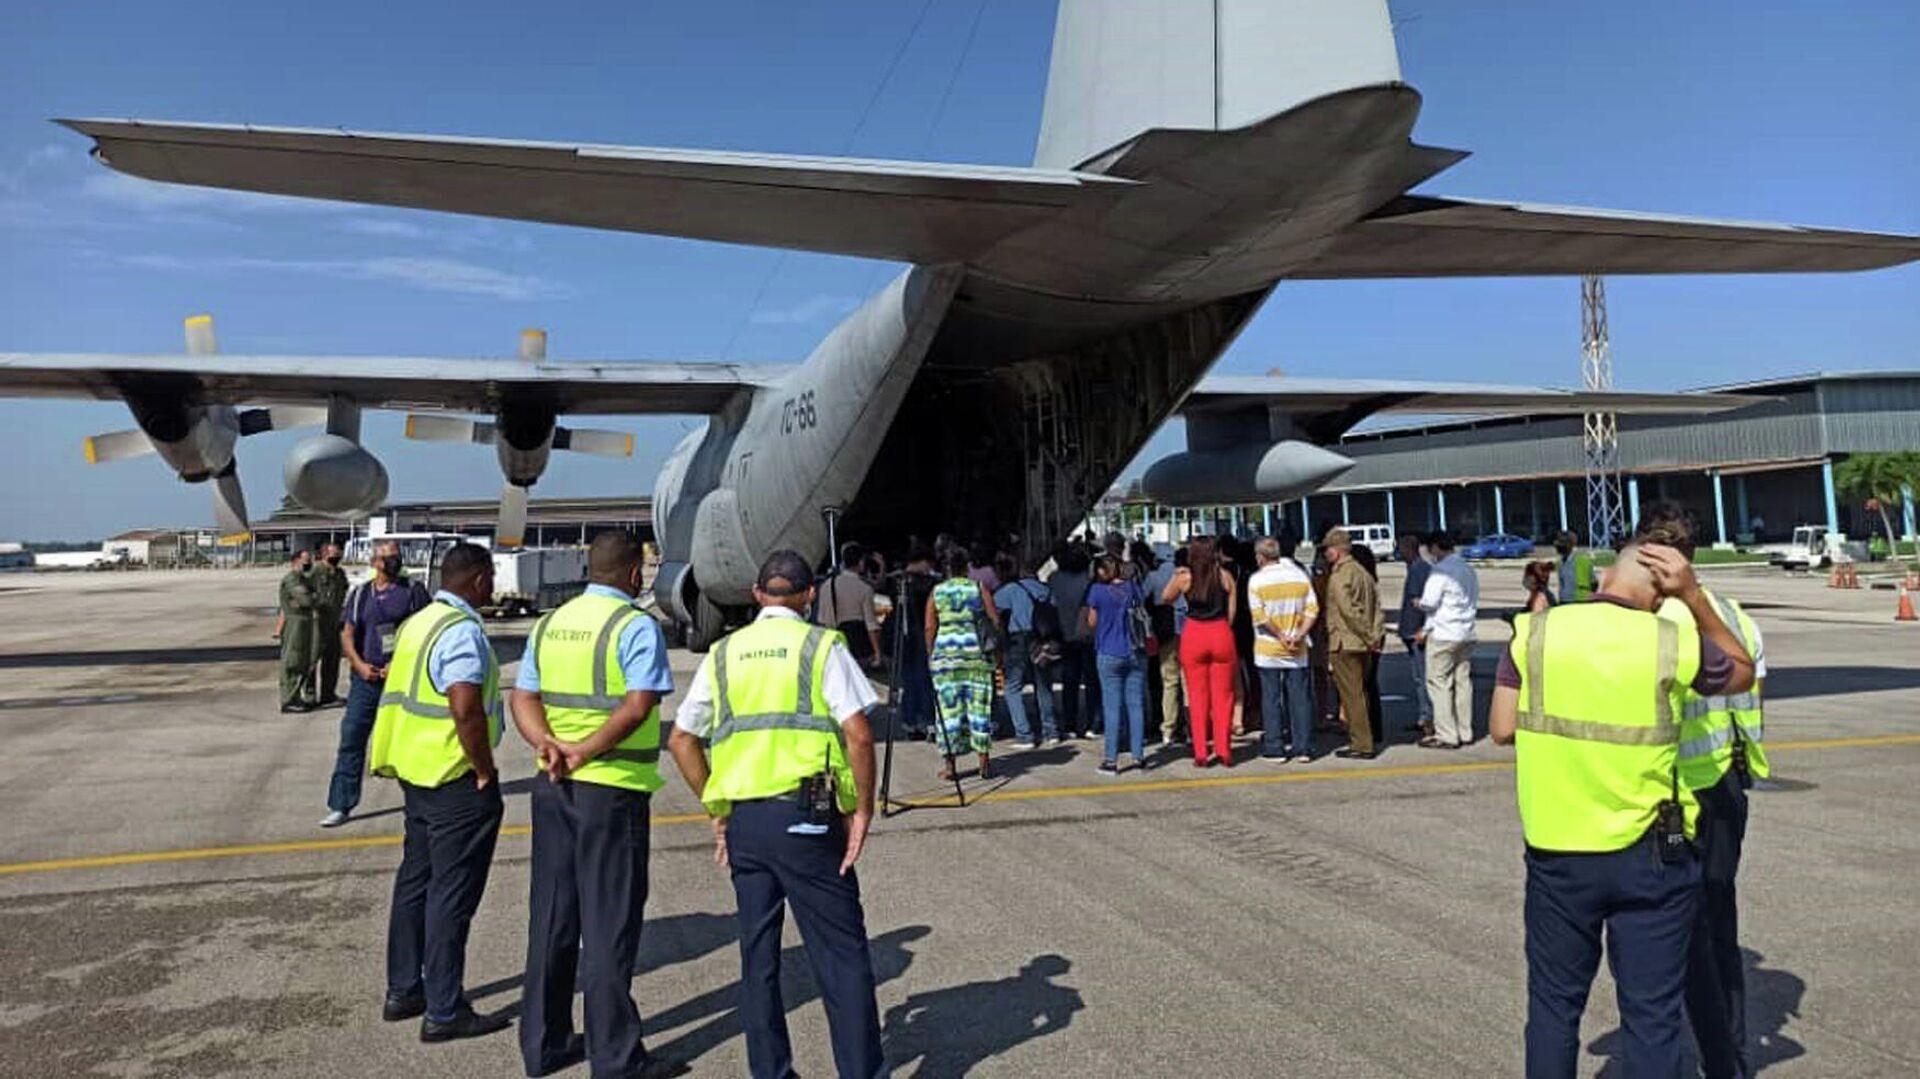 Avión argentino llega a Cuba con ayuda humanitaria para enfrentar pandemia de COVID-19 - Sputnik Mundo, 1920, 05.09.2021